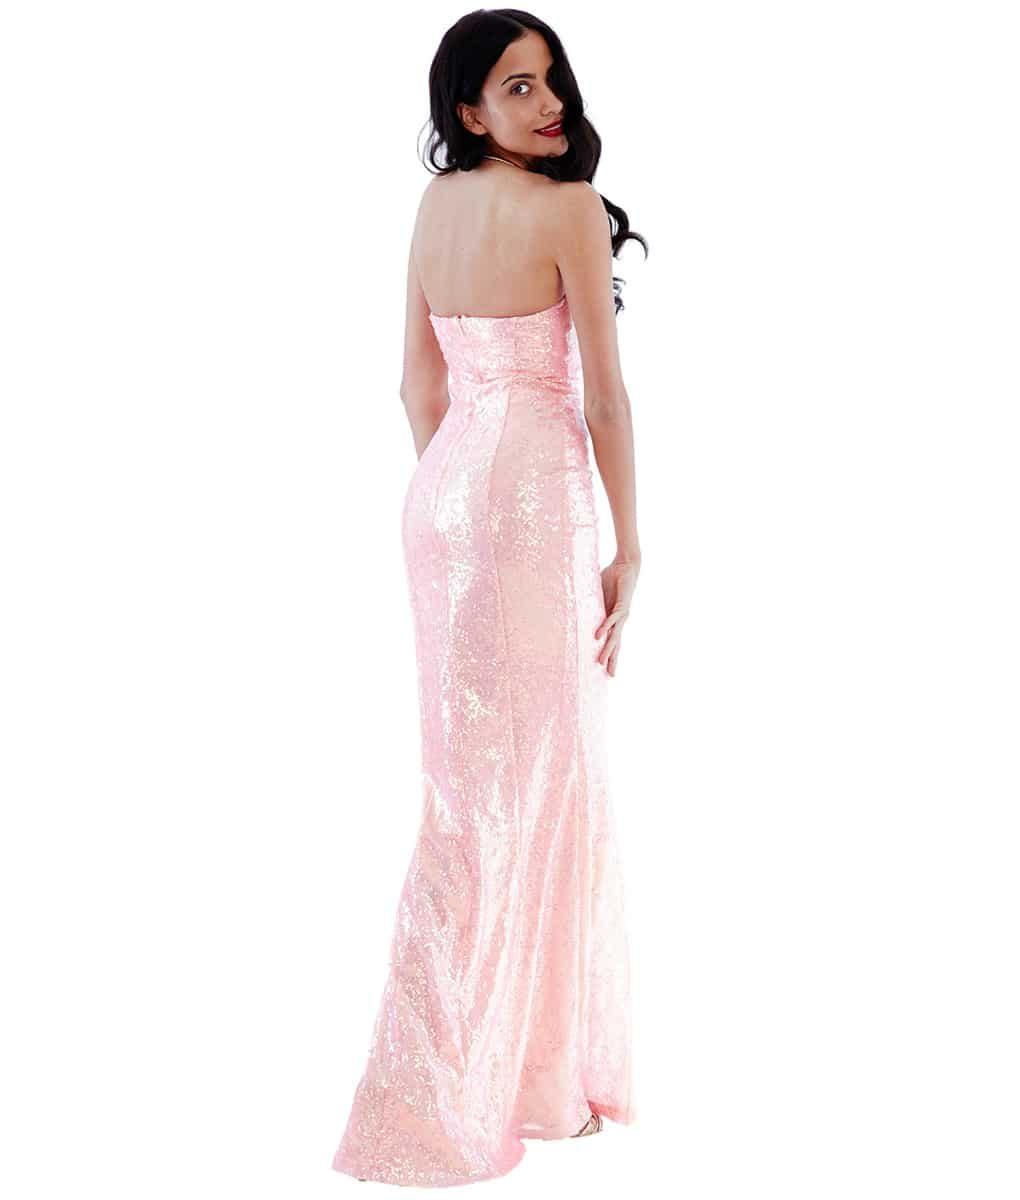 Alila Peach Sequin gown city goddess